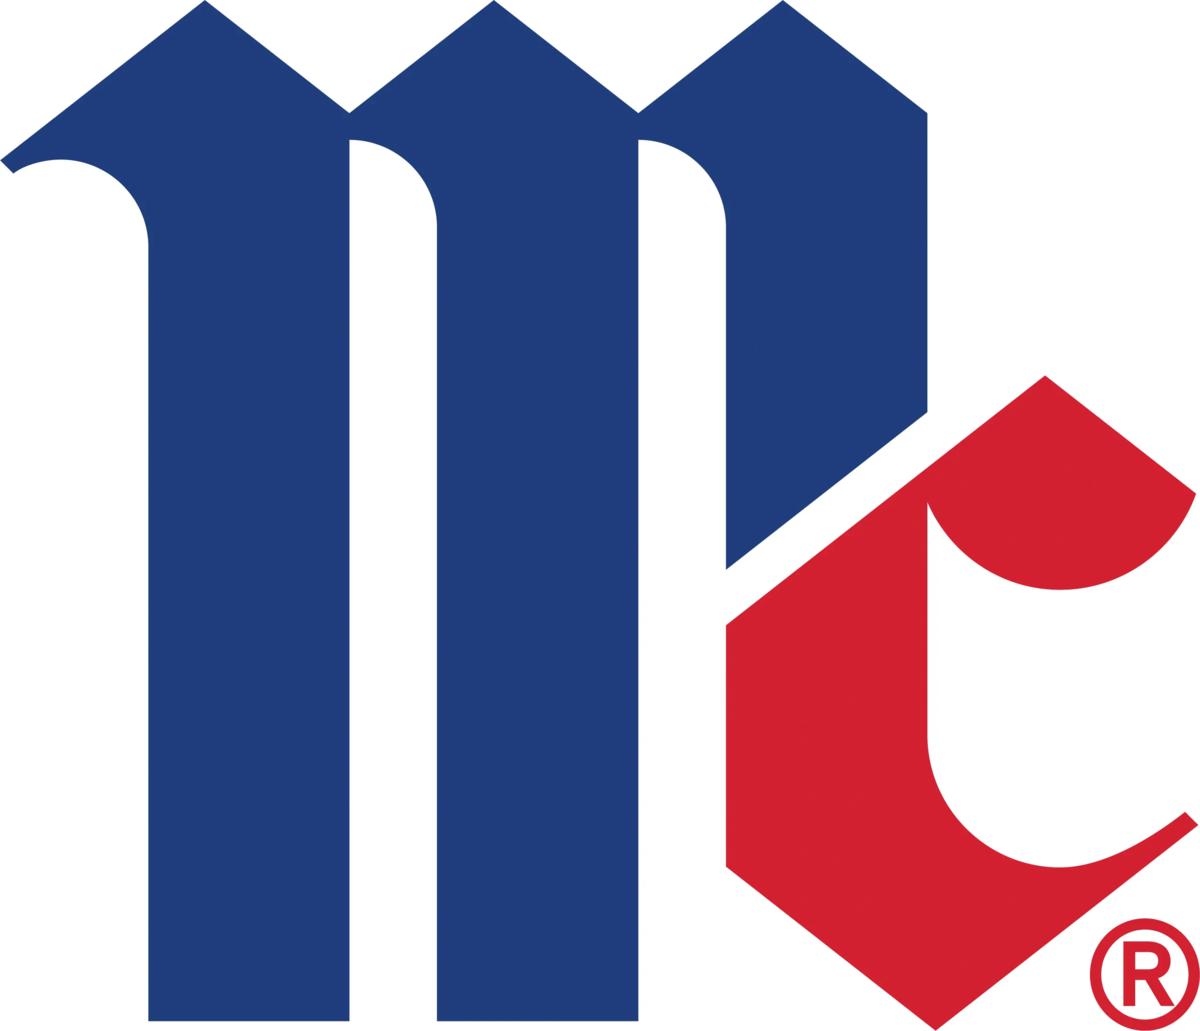 McCormick & Company's logo